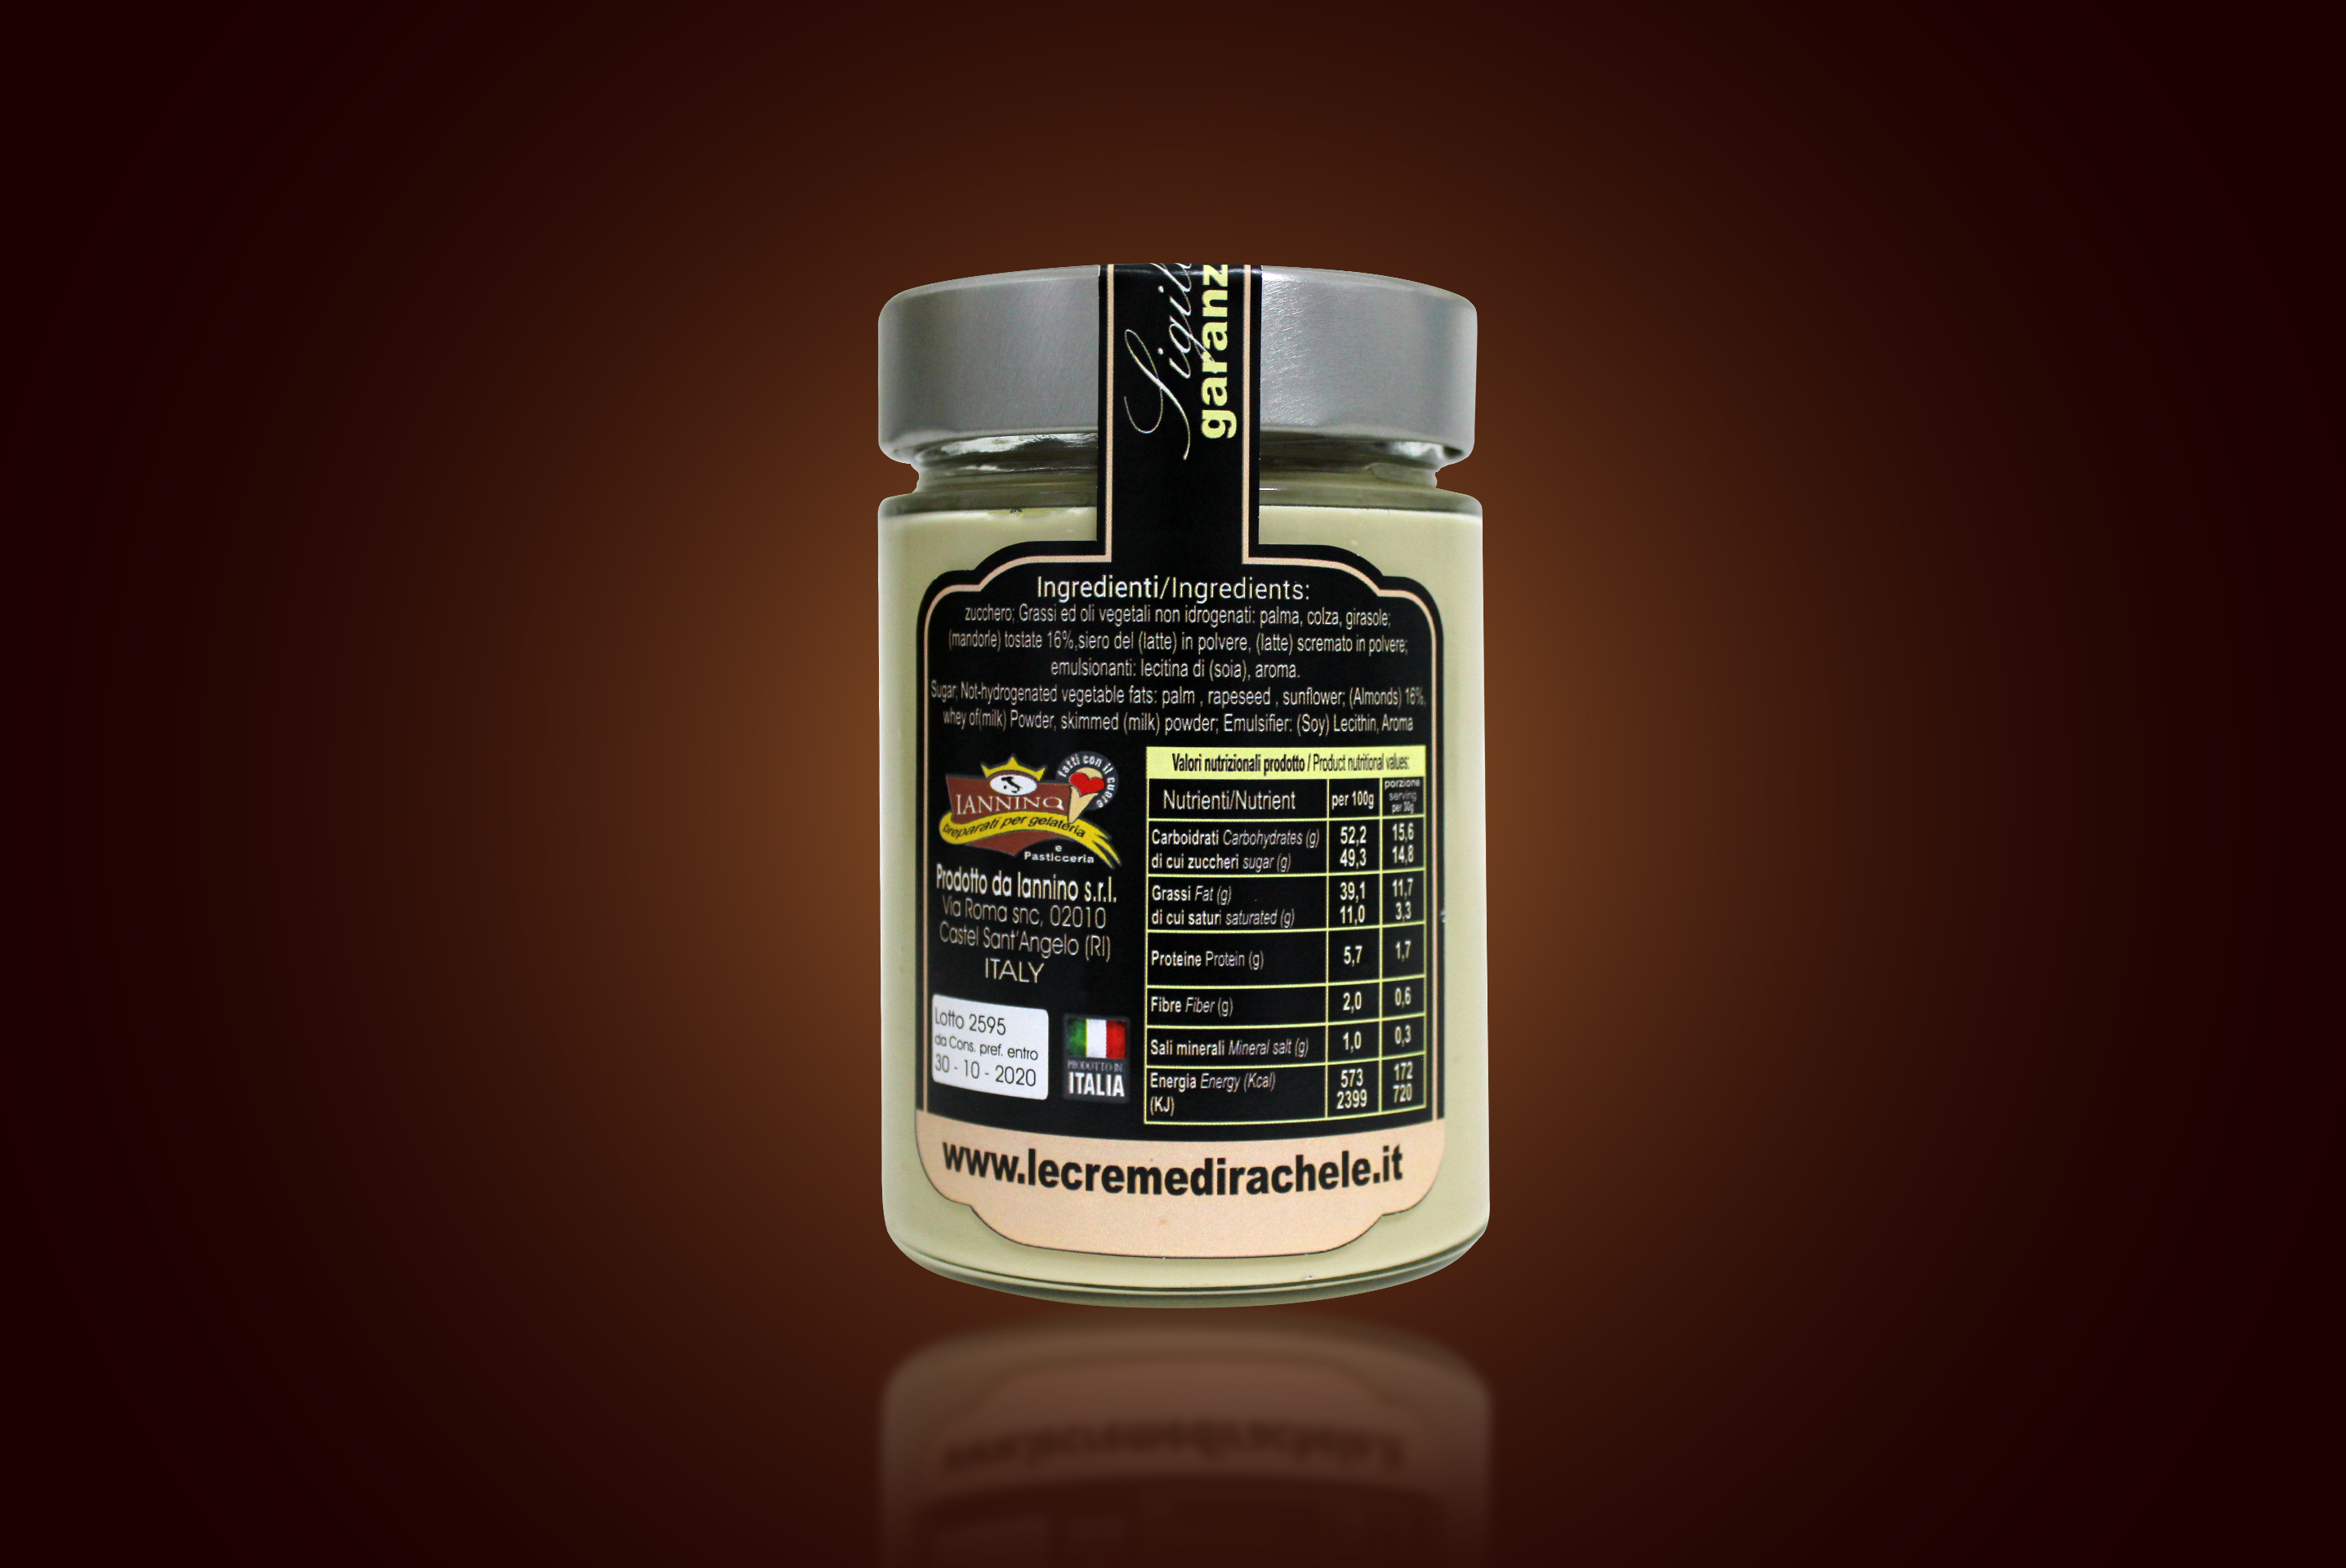 Crema-Gemella-2